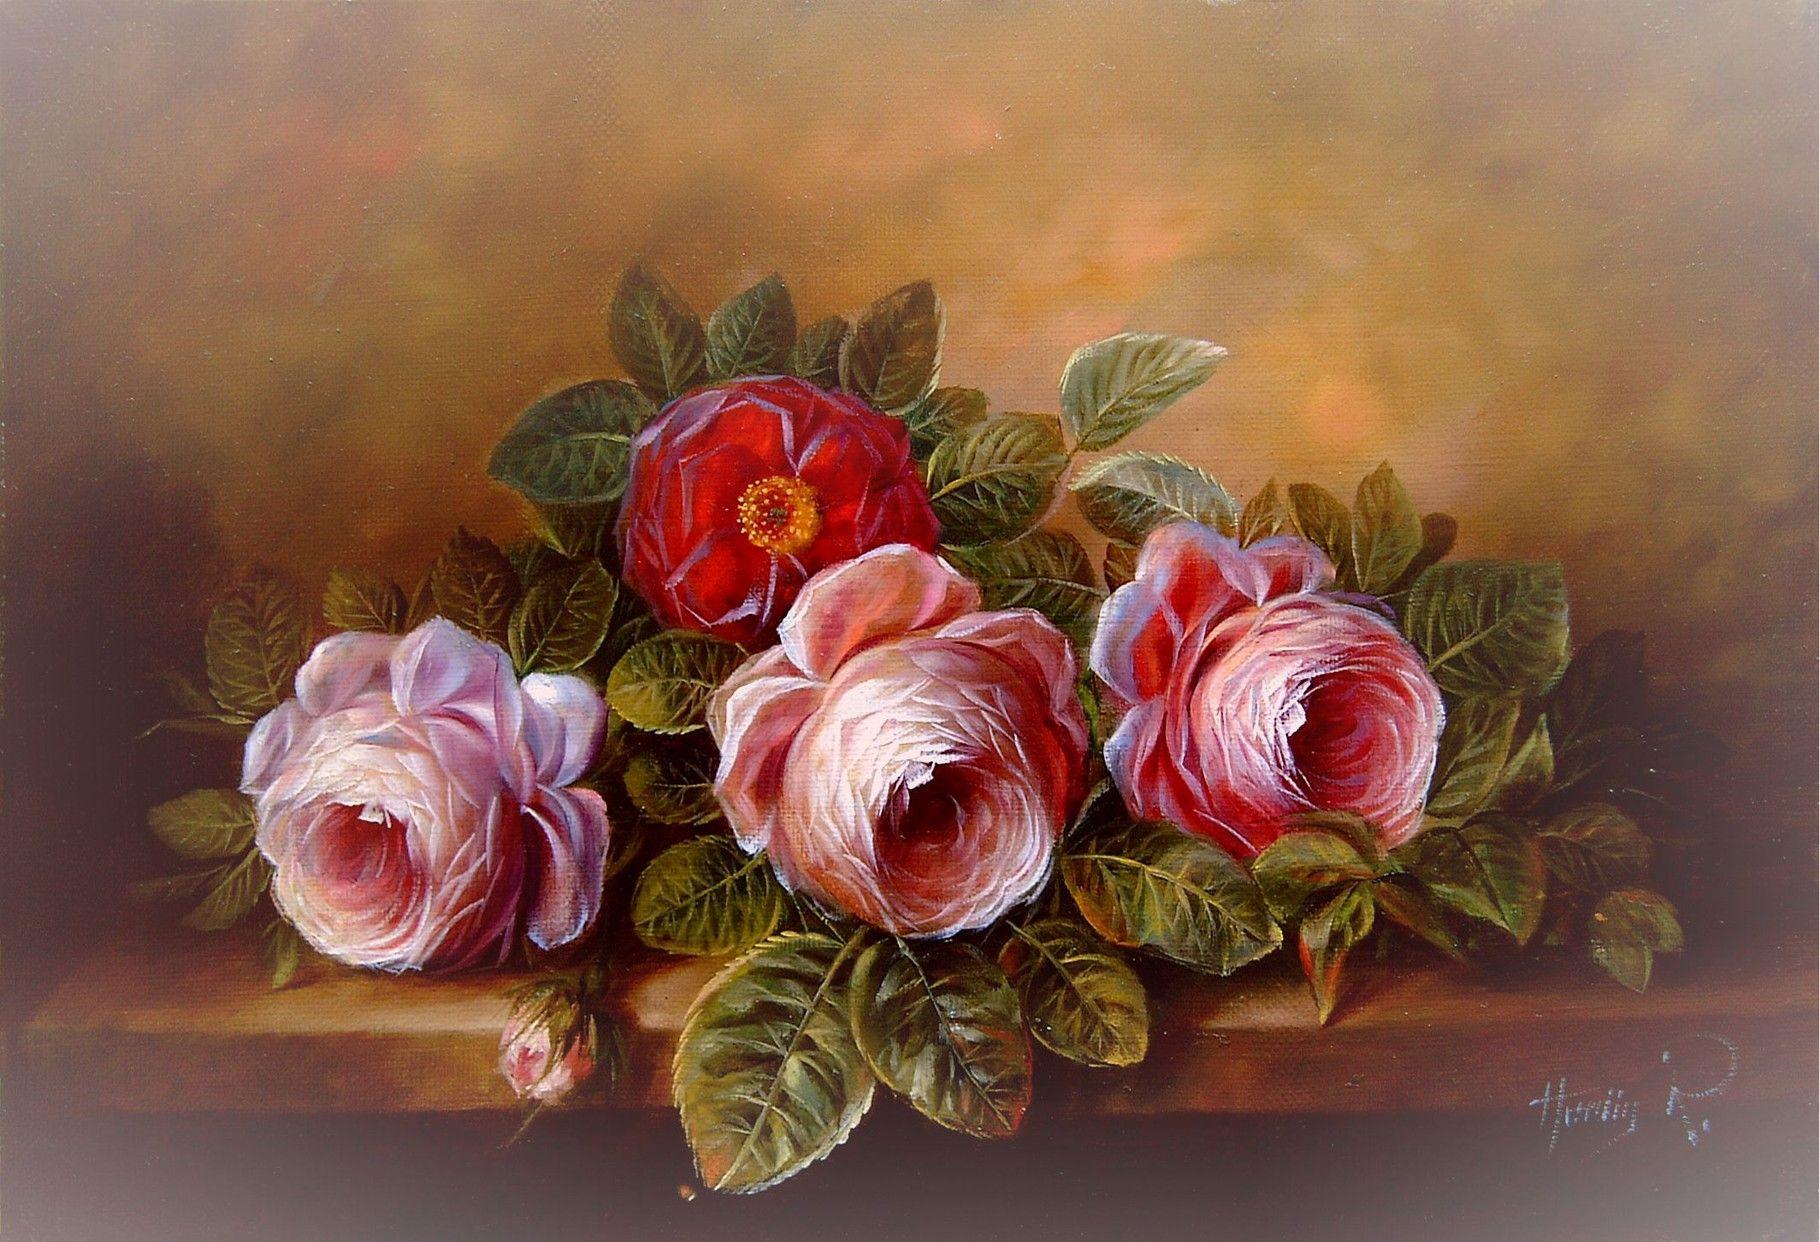 BlumenStillleben  lmalerei Atelier Herdin  lmalerei  Pinterest  Stillleben Malerei und